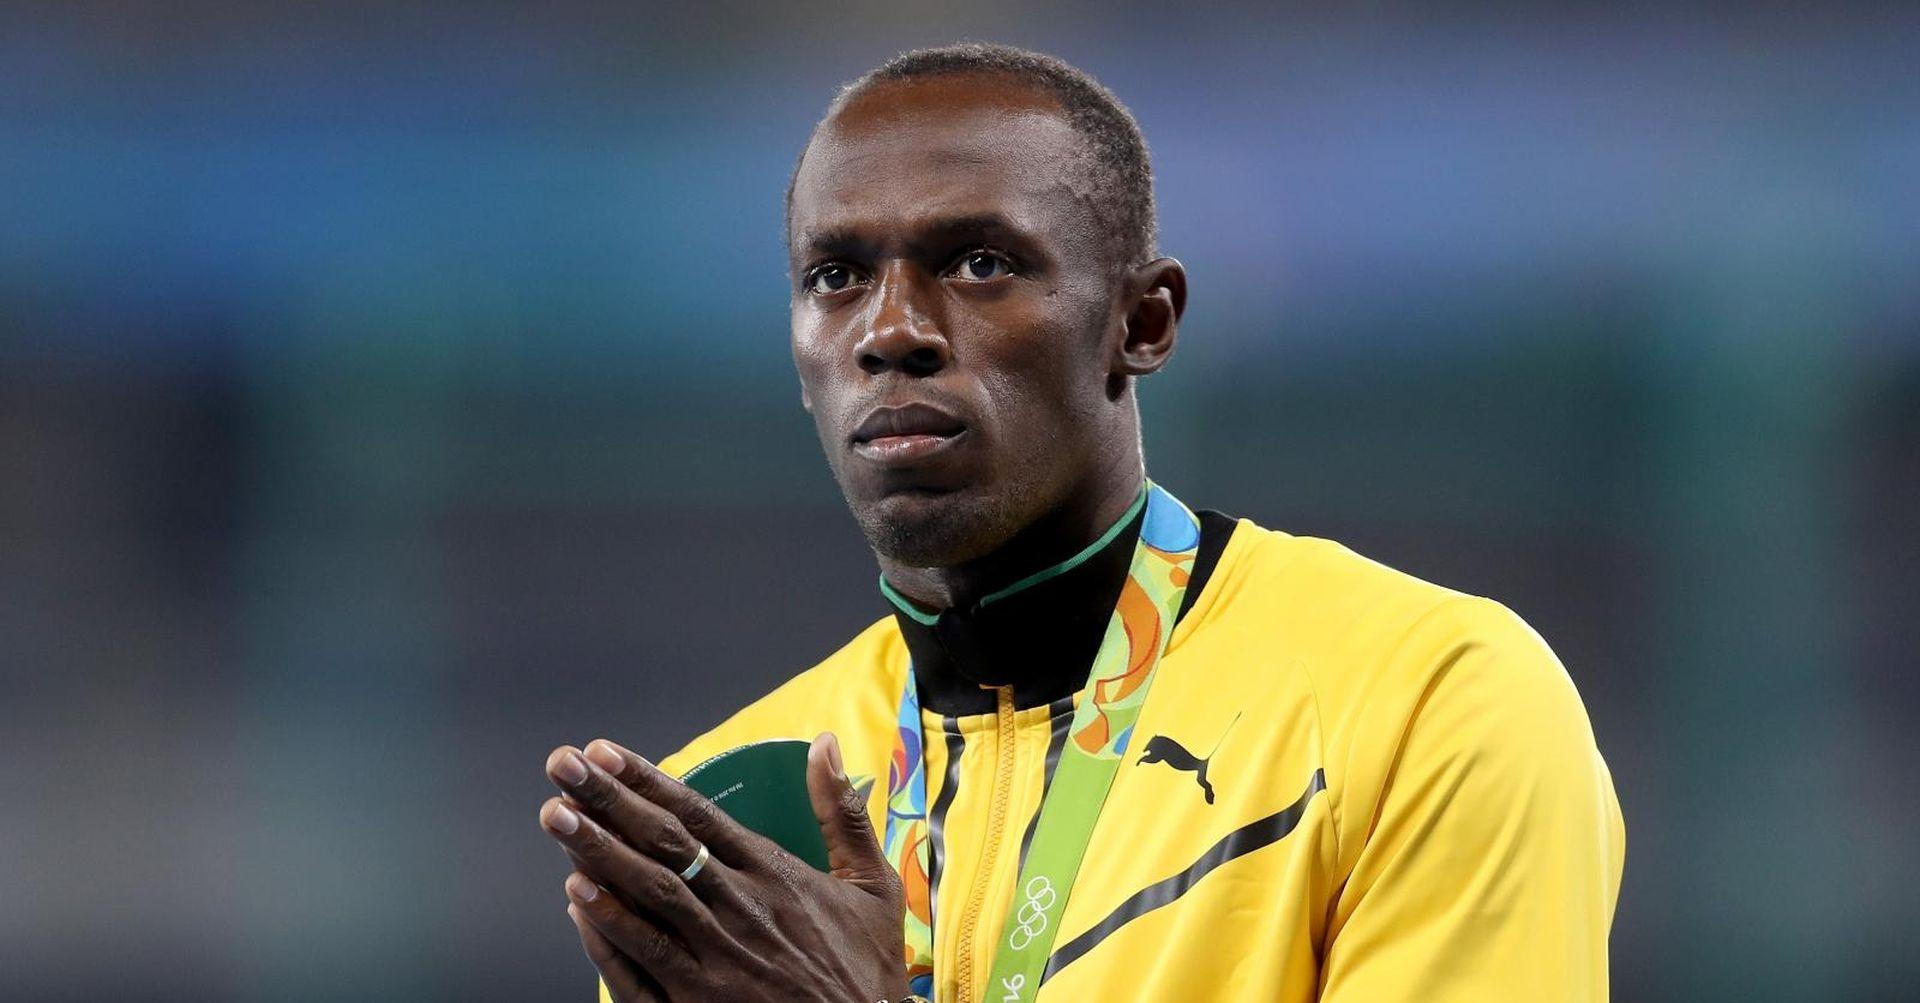 Bolt završio australsku avanturu